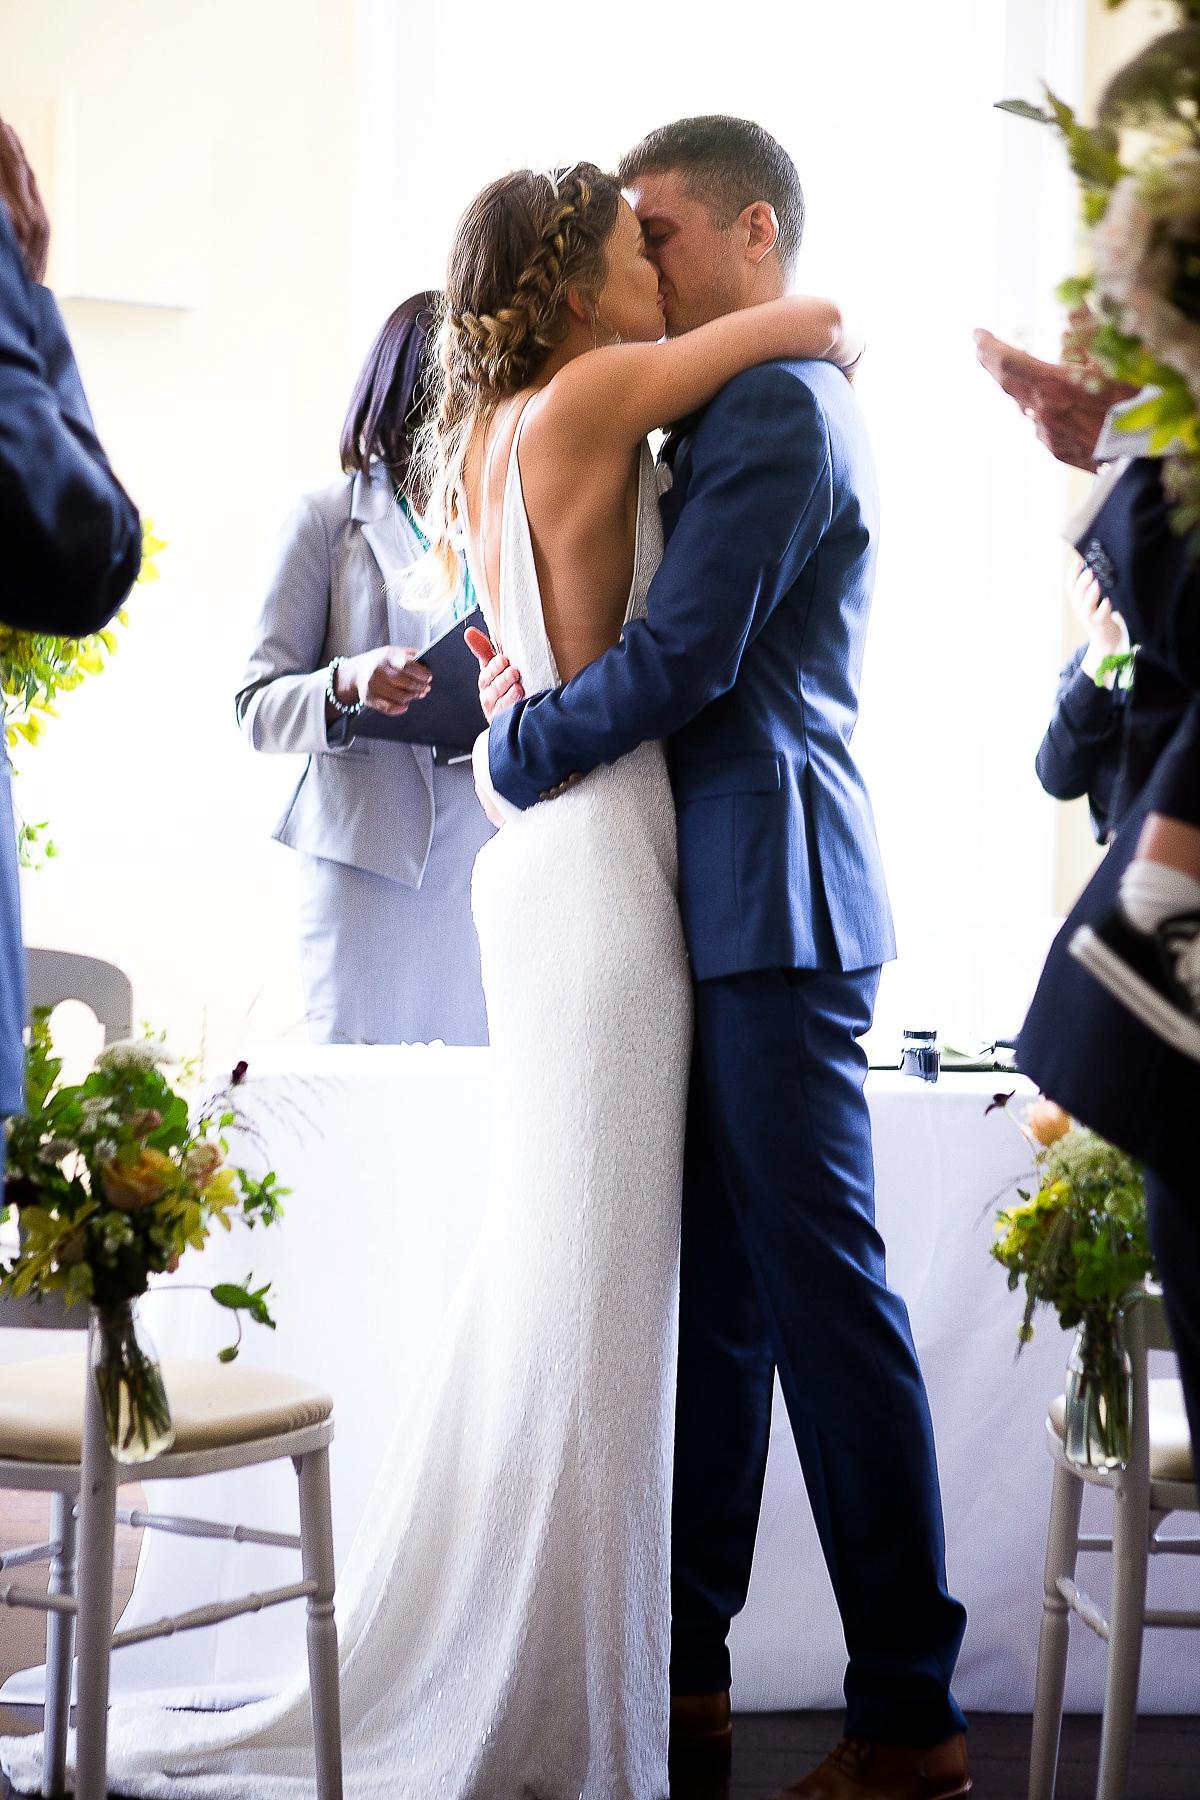 And-For-Love-wedding-dress-17.jpg